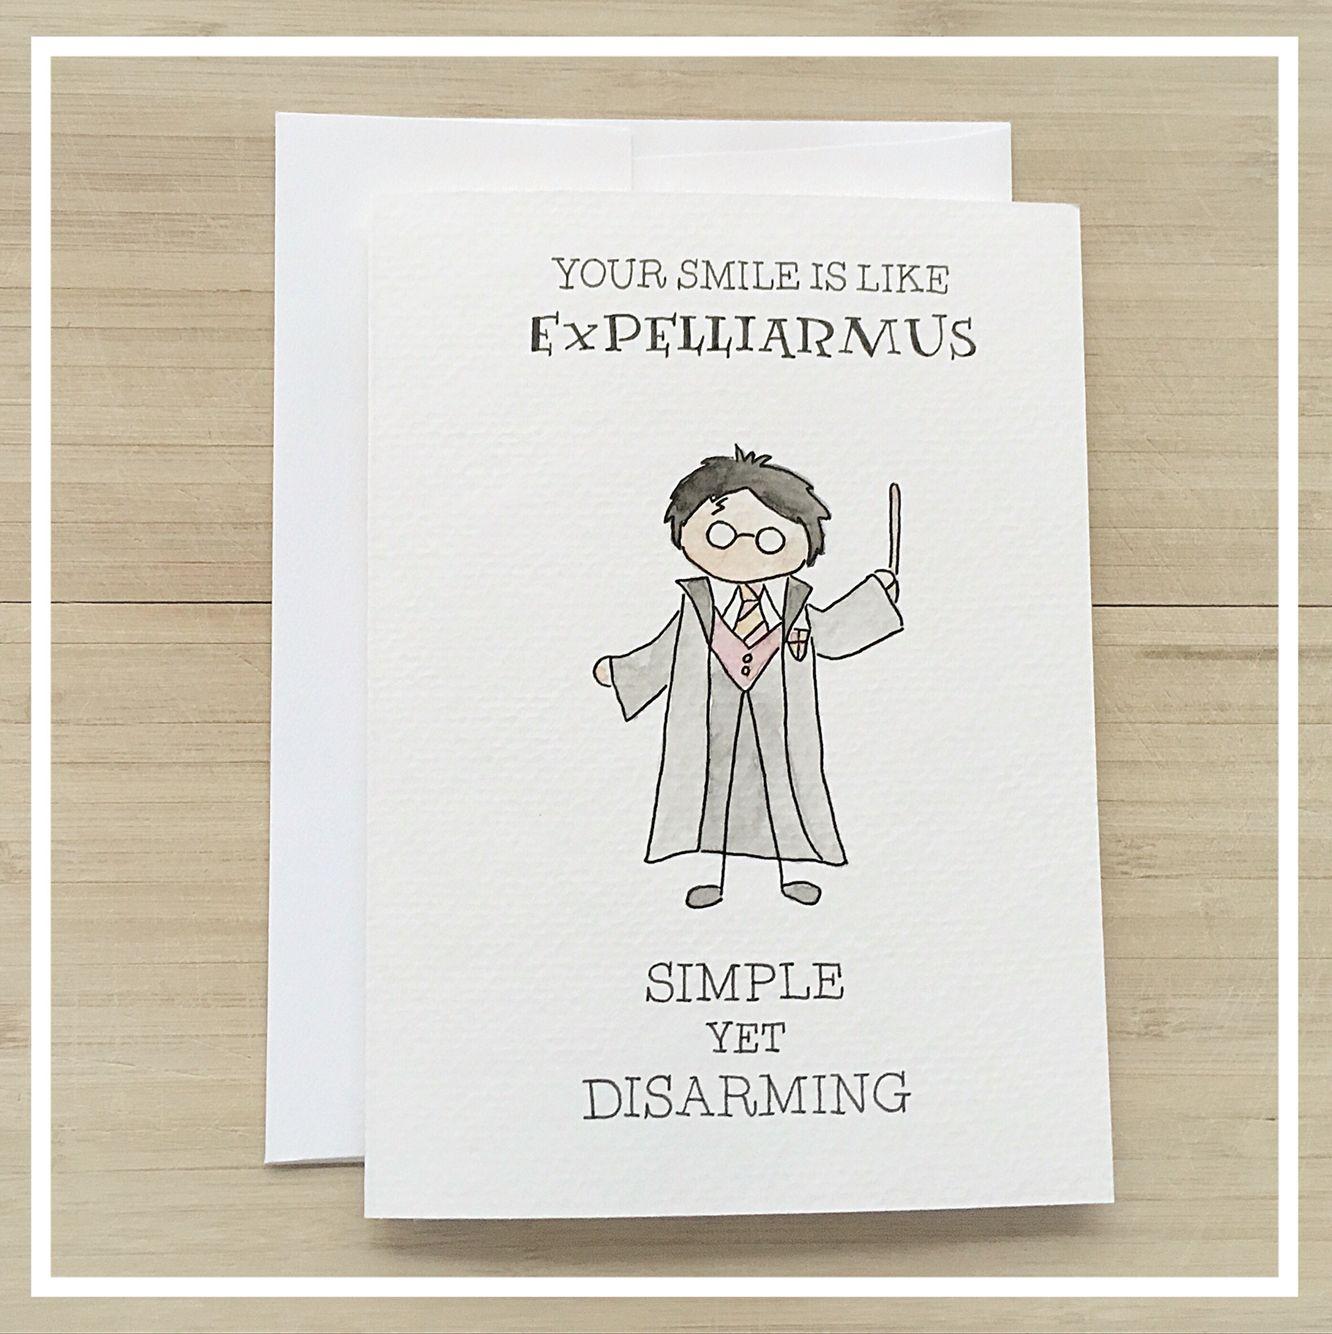 Harry Potter Love Card Www Etsy Com Ca Shop Kenziecardco Www Kenziecards Com Harry Potter Cards Harry Potter Birthday Cards Harry Potter Valentines